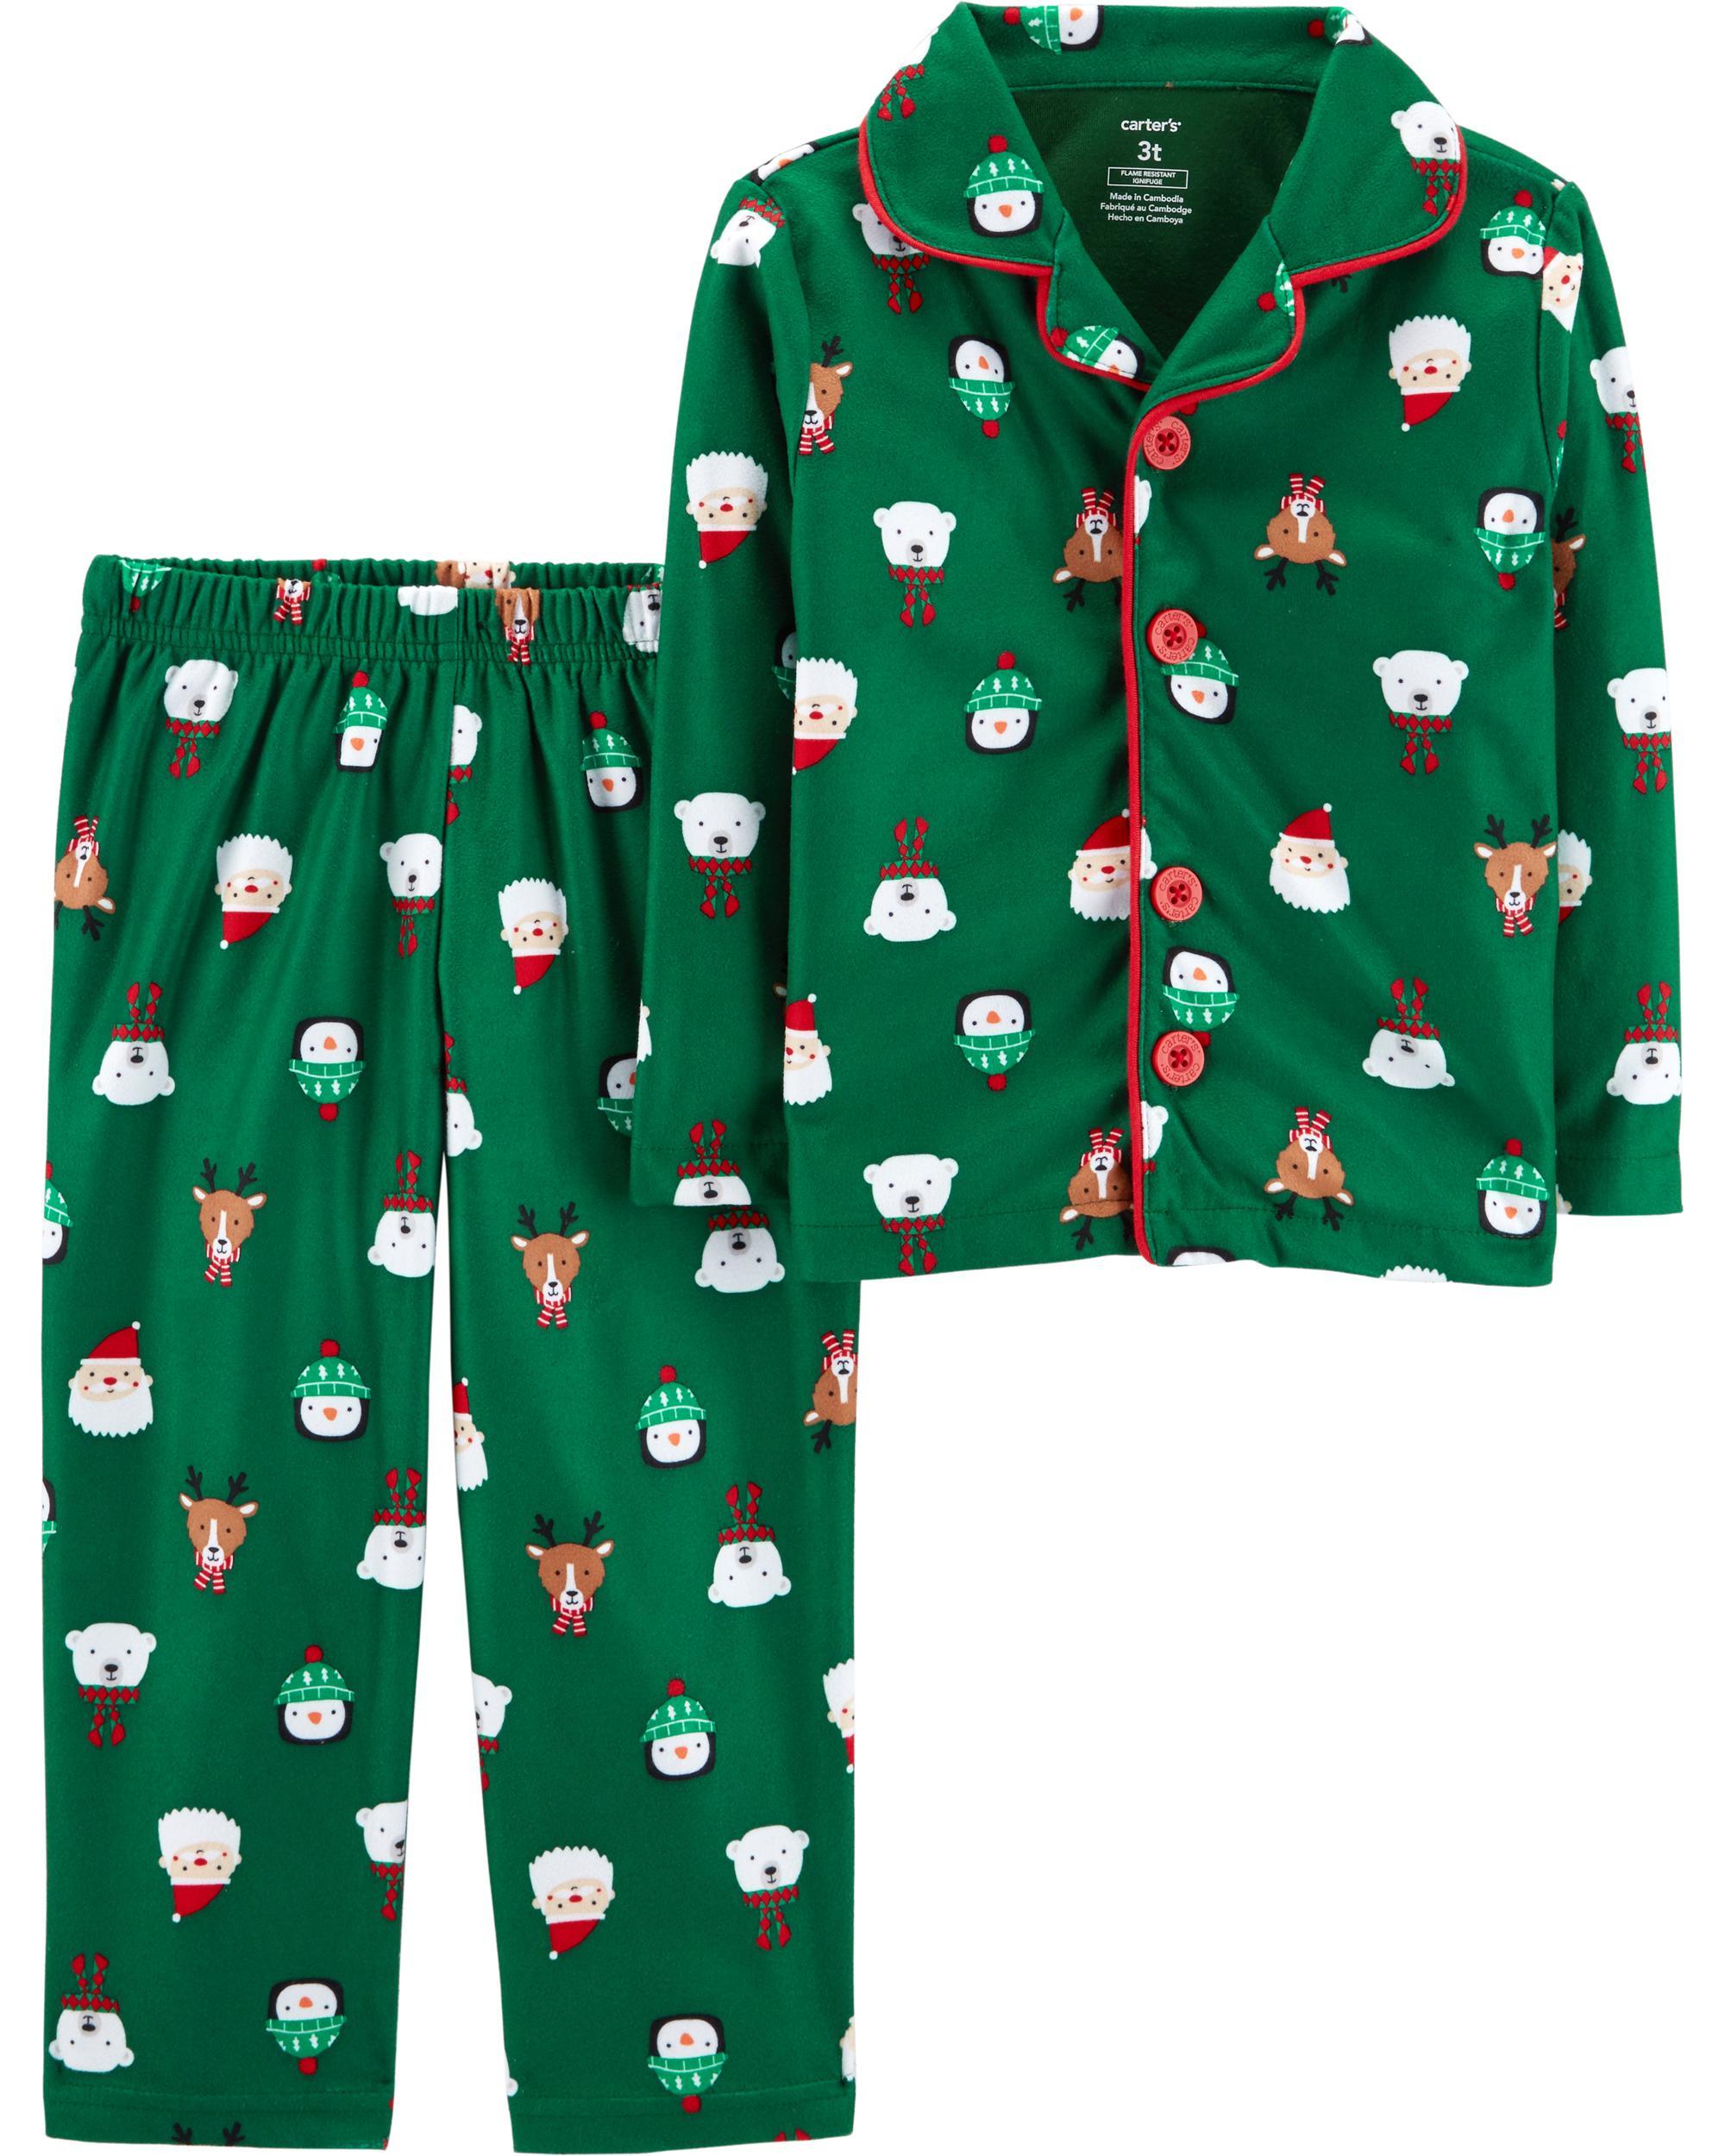 Toddler Christmas Pajamas.2 Piece Toddler Christmas Lightweight Fleece Pjs Oshkosh Com